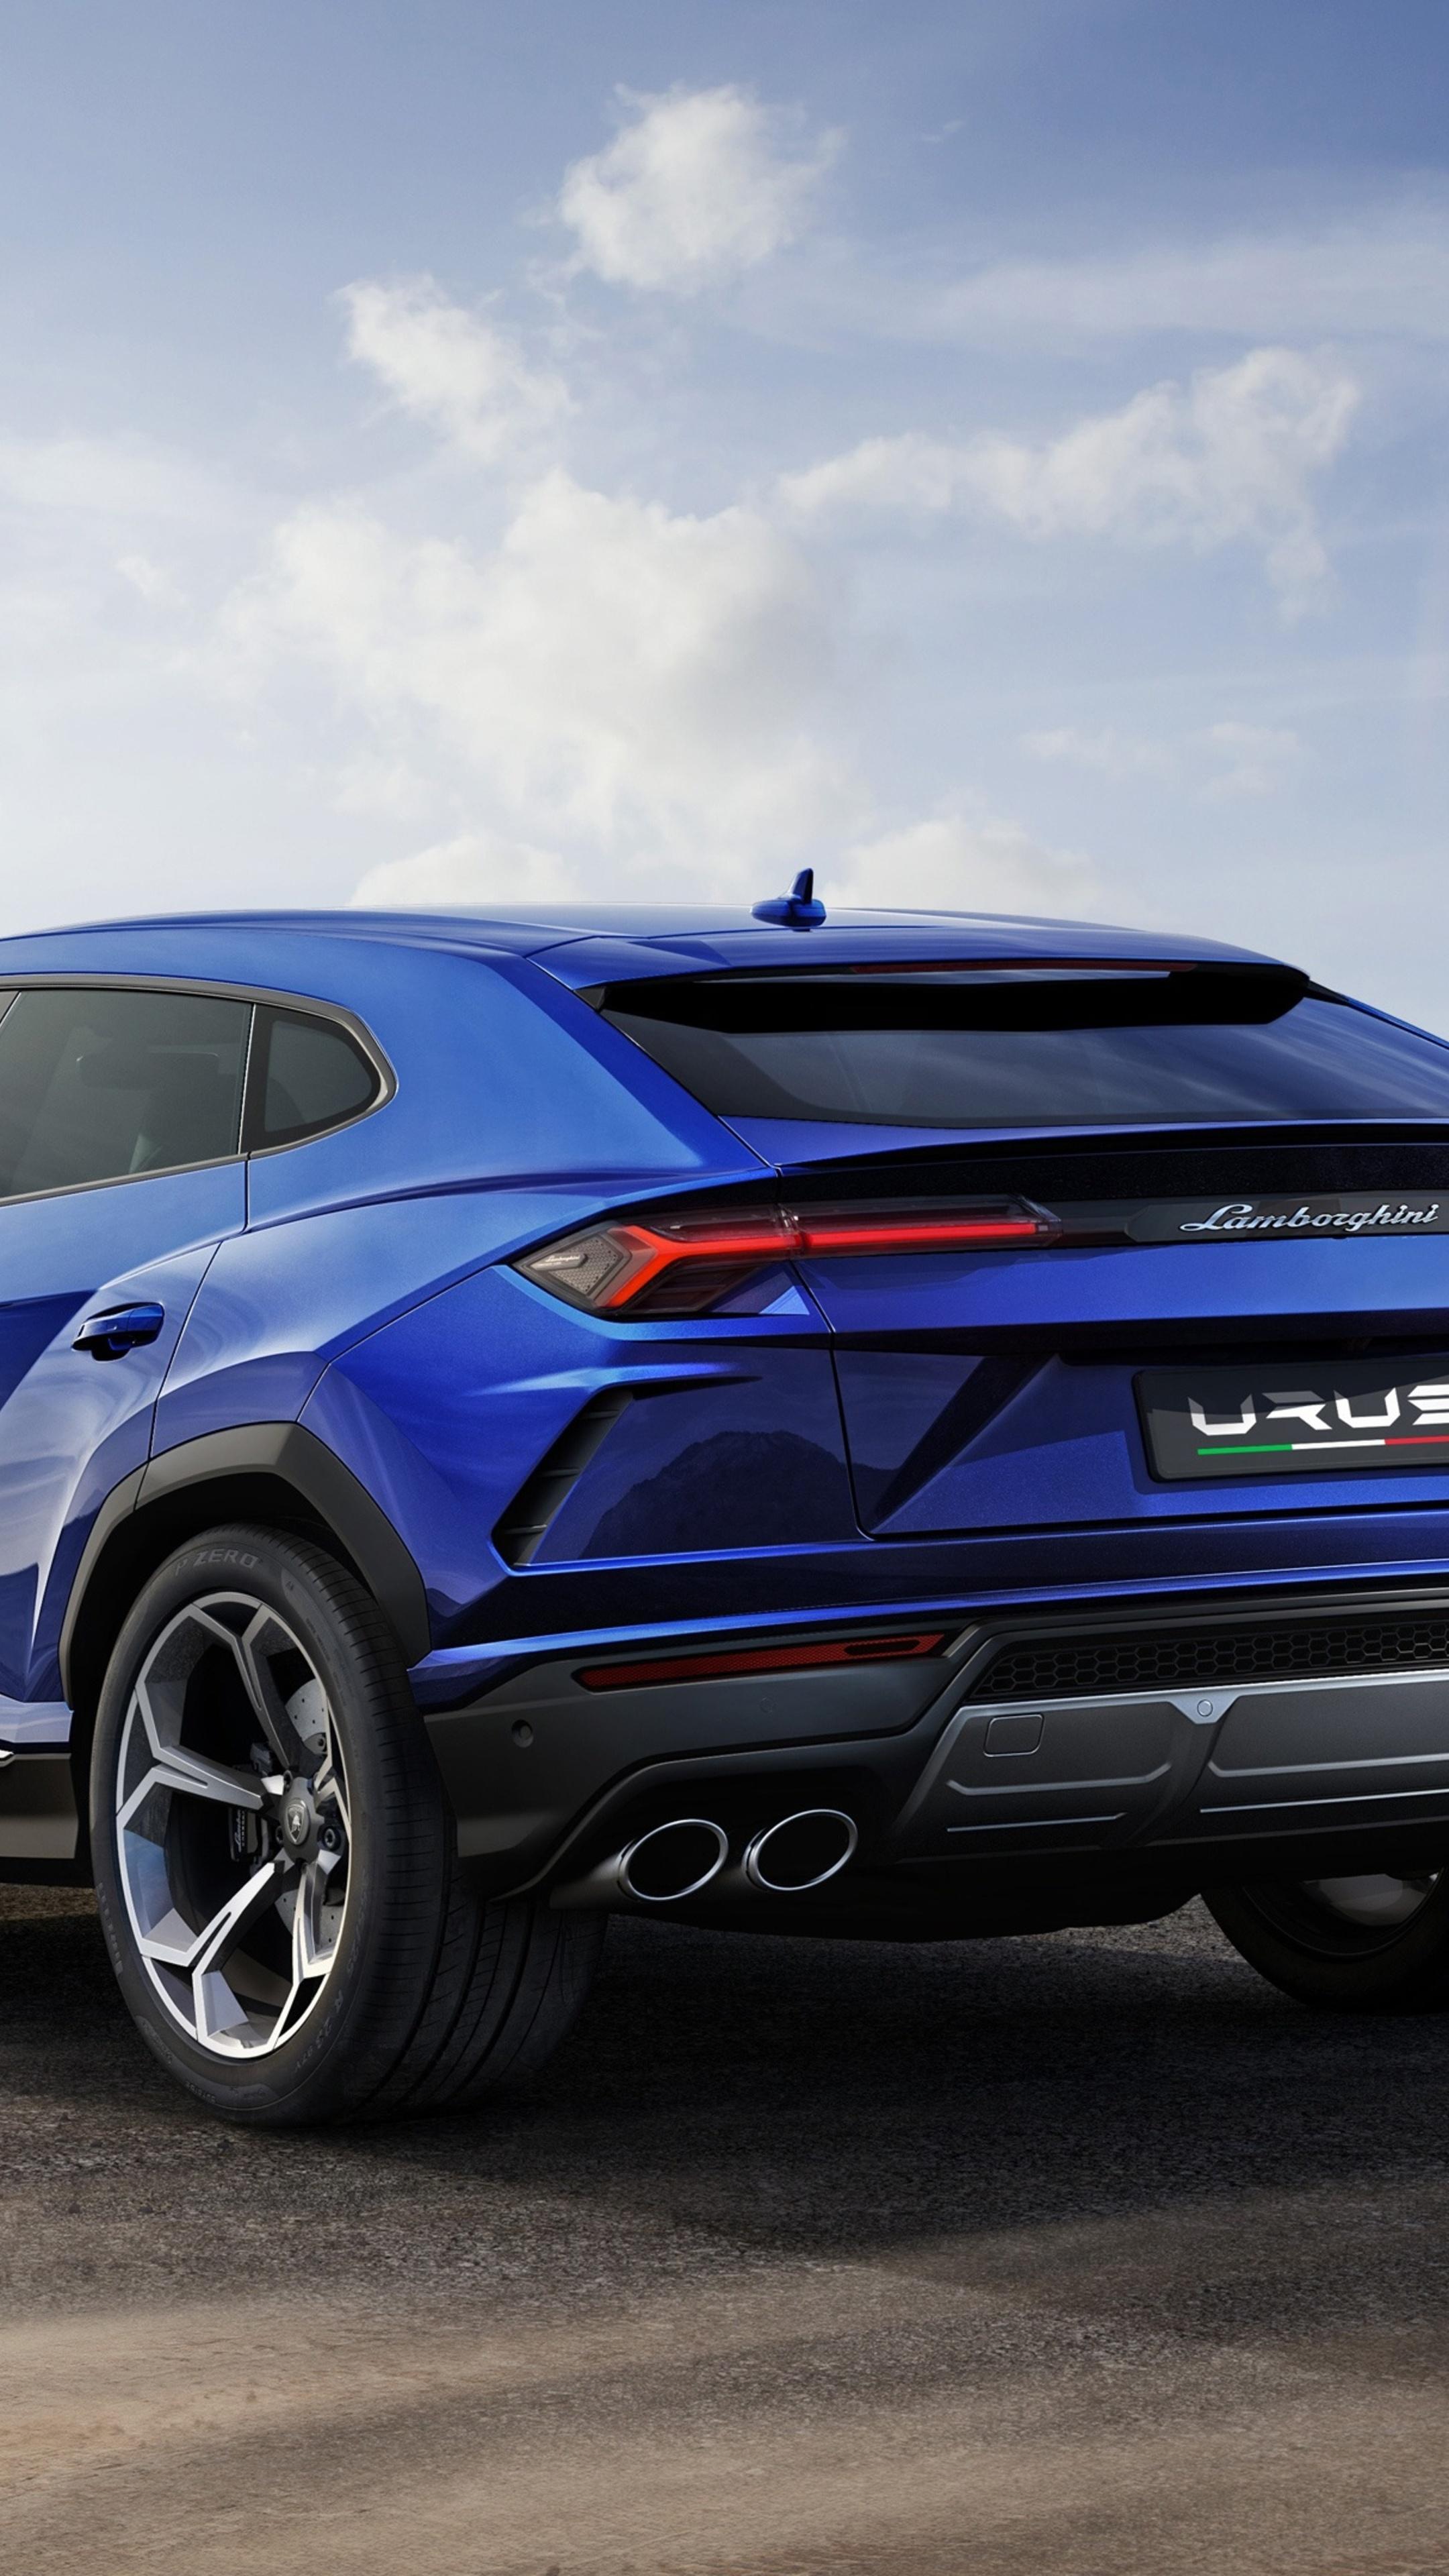 Lambo Urus Blue Car Review And Gallery